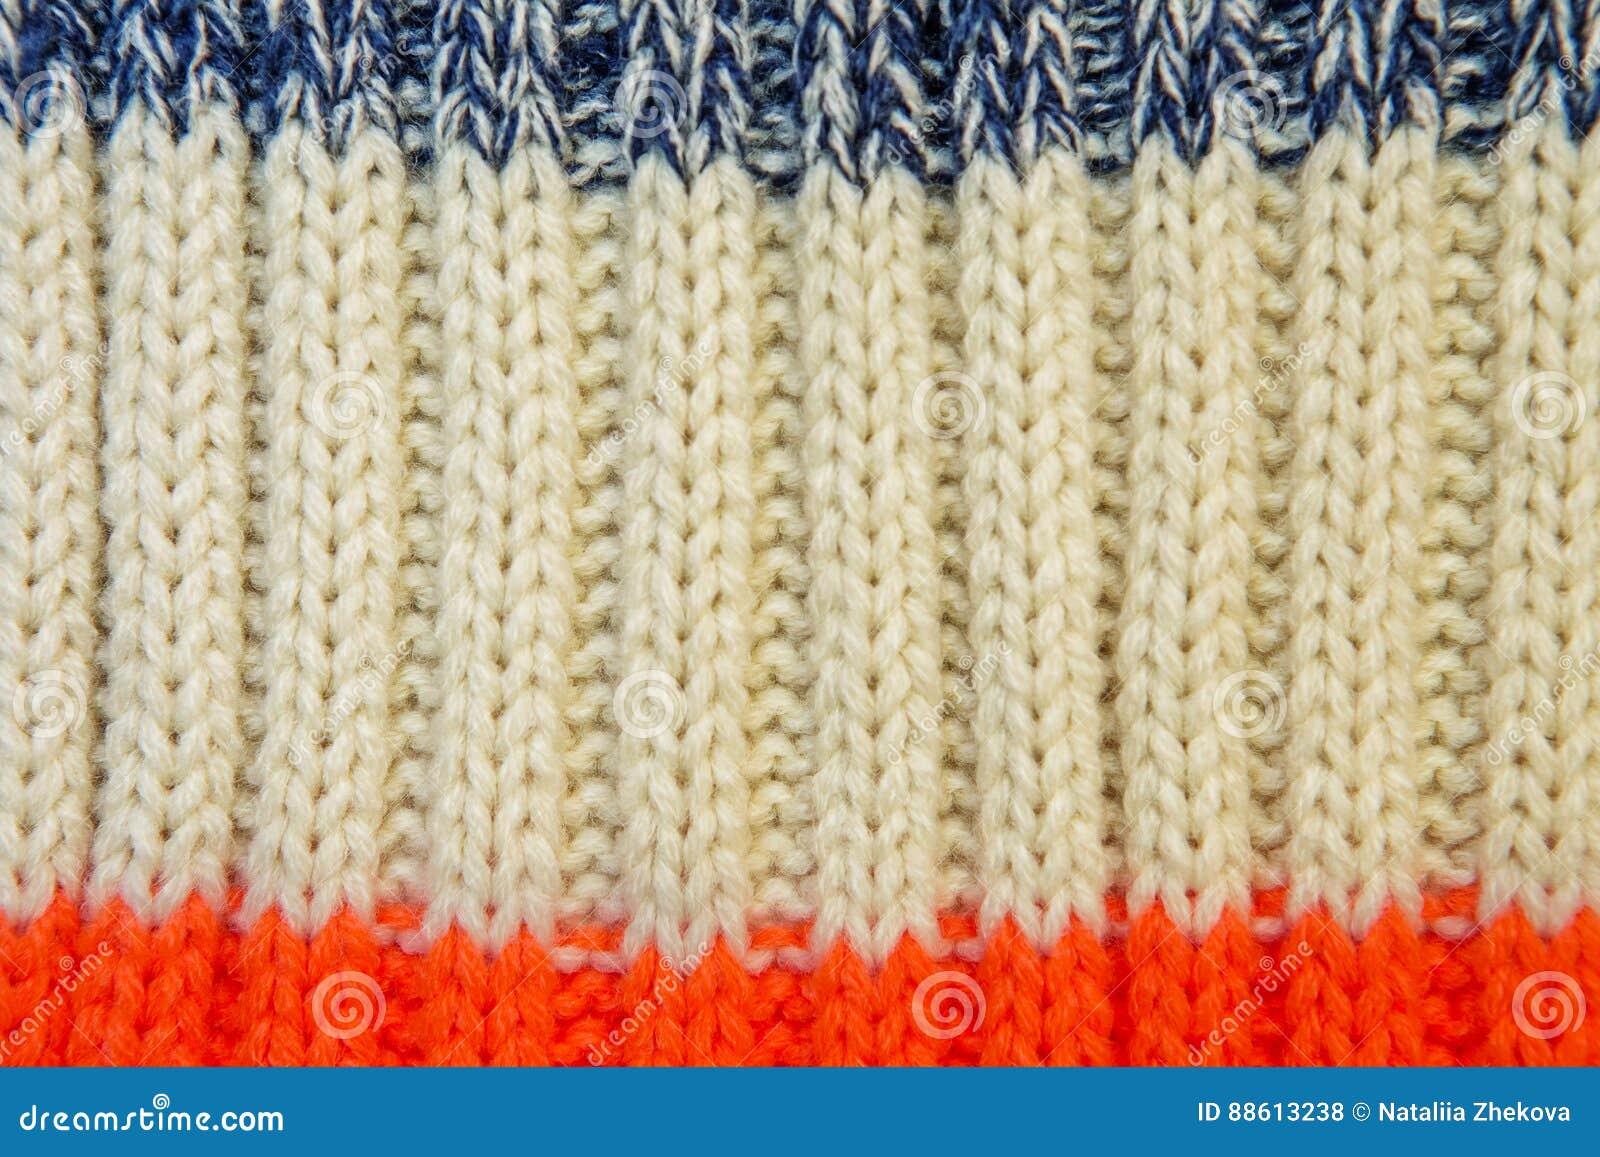 7d82e85a7 Close Up On Knit Woolen Fur Texture. Stock Photo - Image of handmade ...